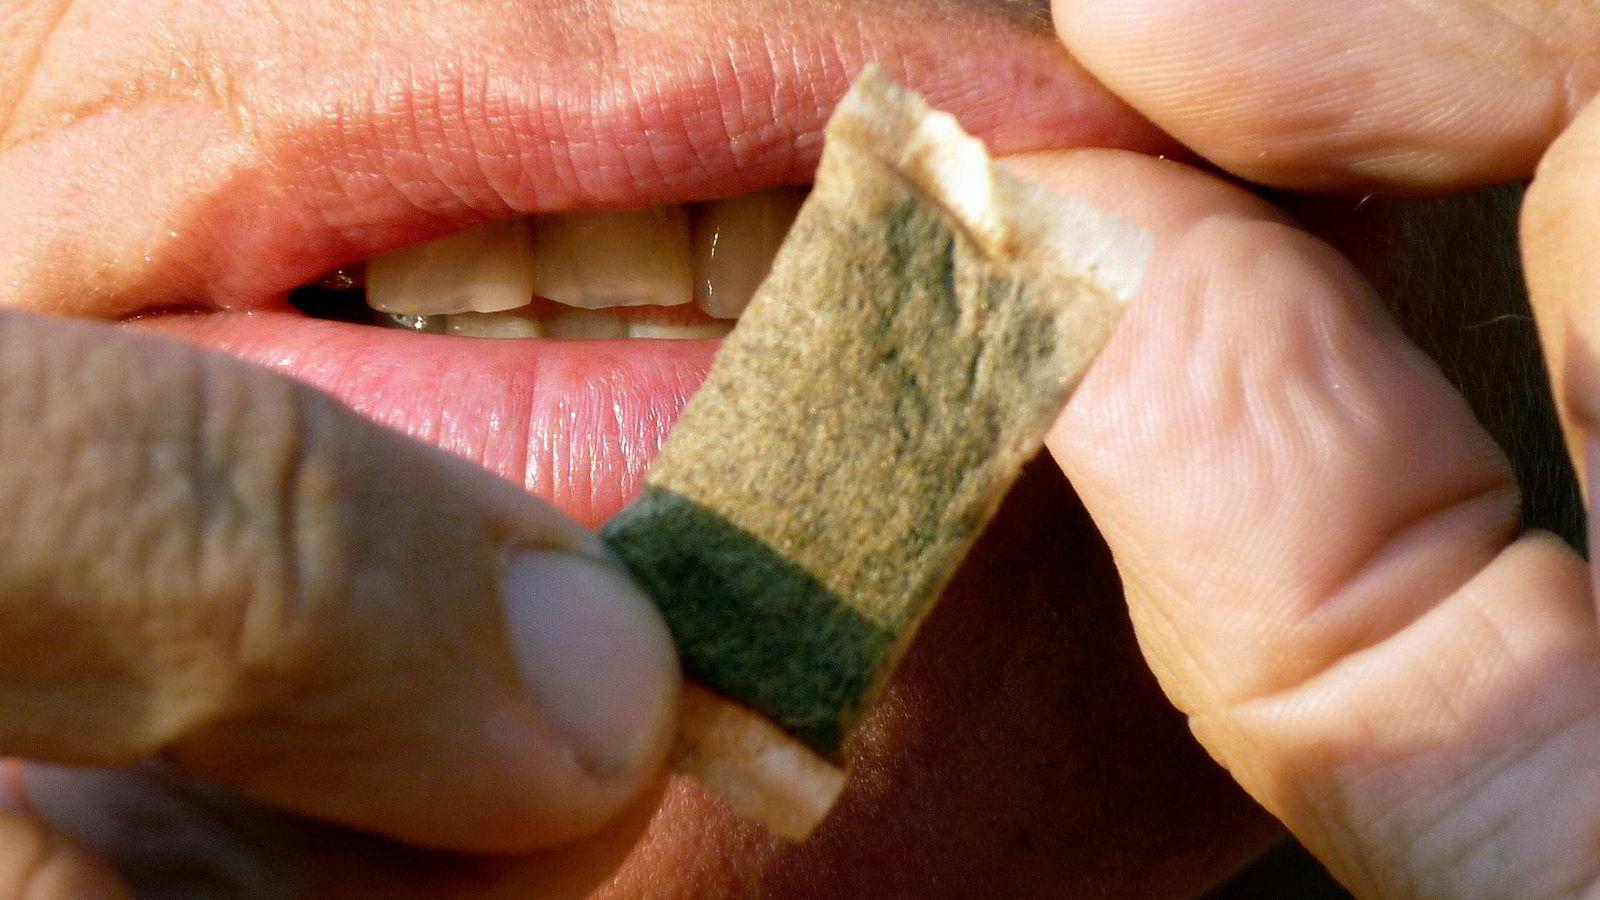 Norge har så langt hatt et tilsvarende unntak som Sverige fra snusforbudet gjennom en tilpasning i EØS.